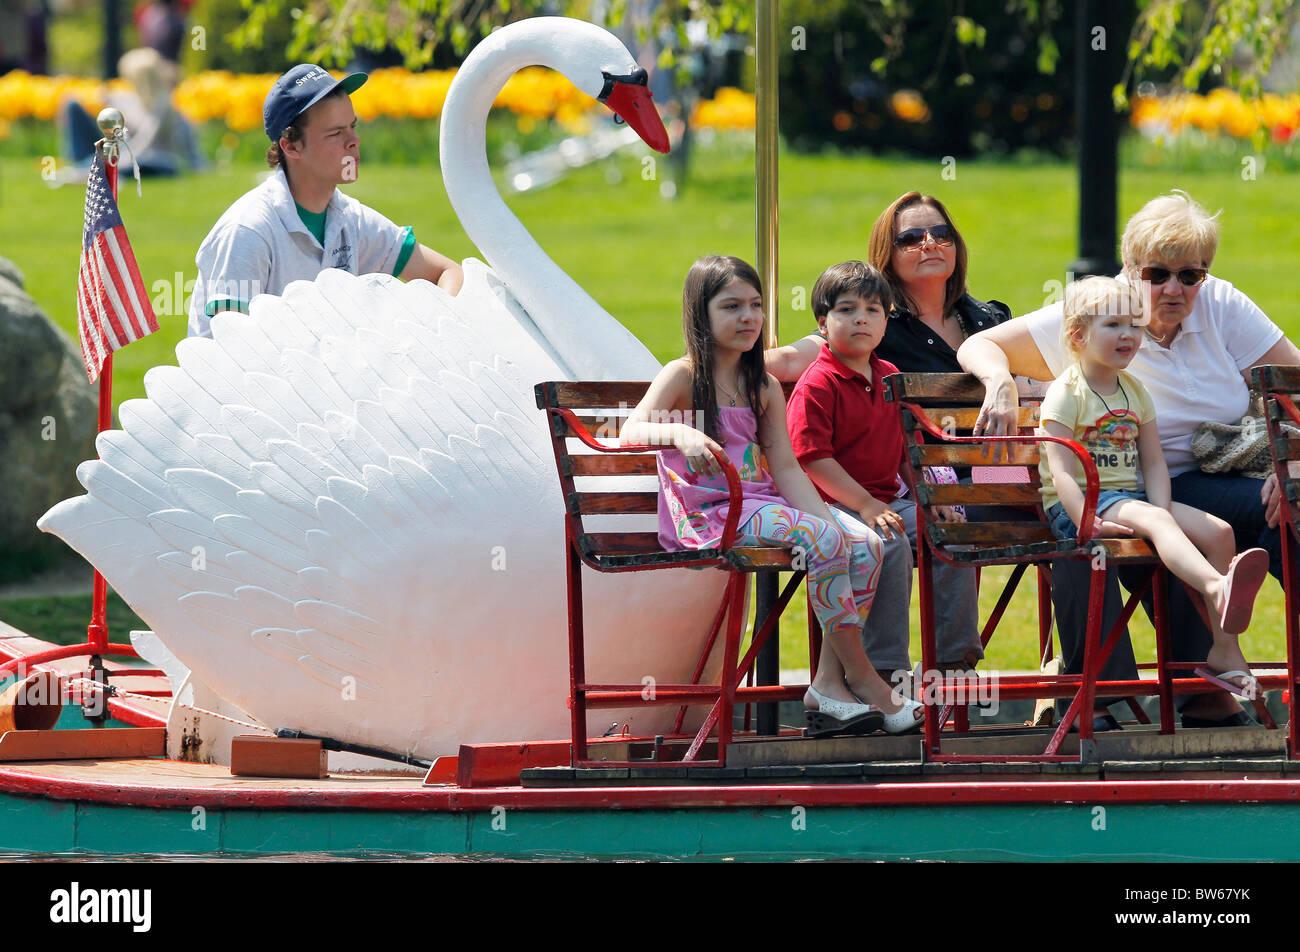 A swan boat, Public Gardens, Boston, Massachusetts - Stock Image